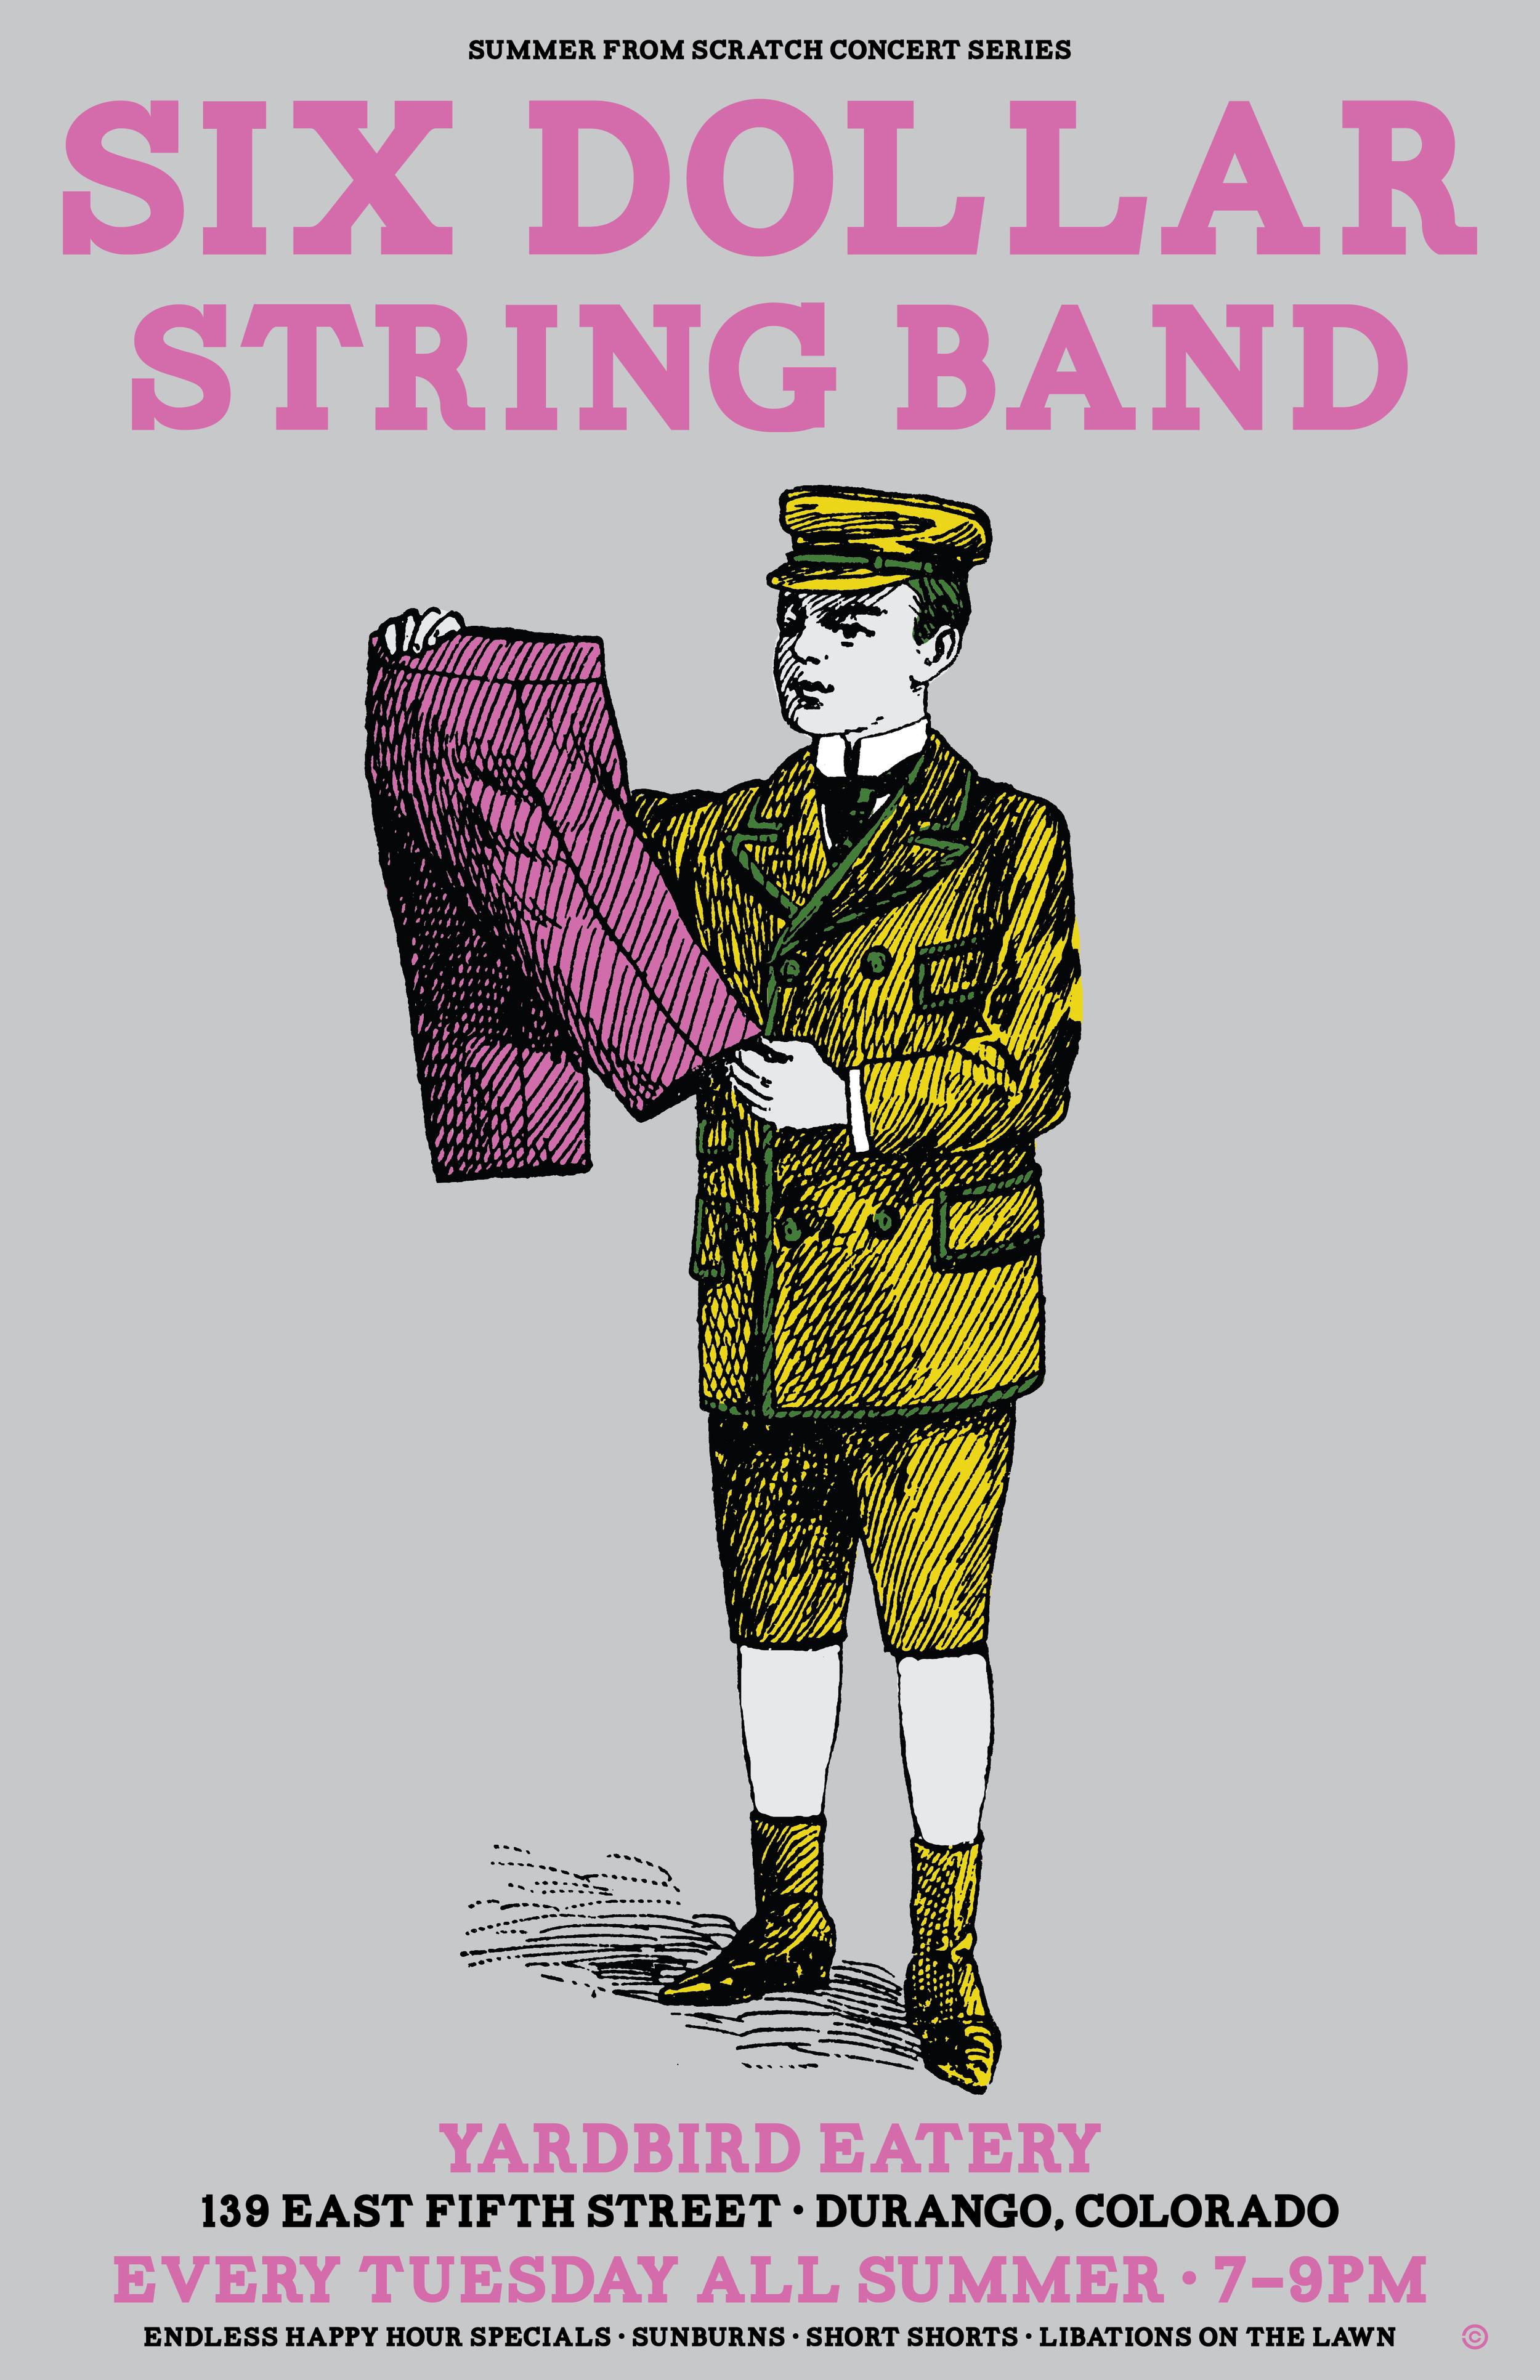 Short Pants - Six Dollar String band